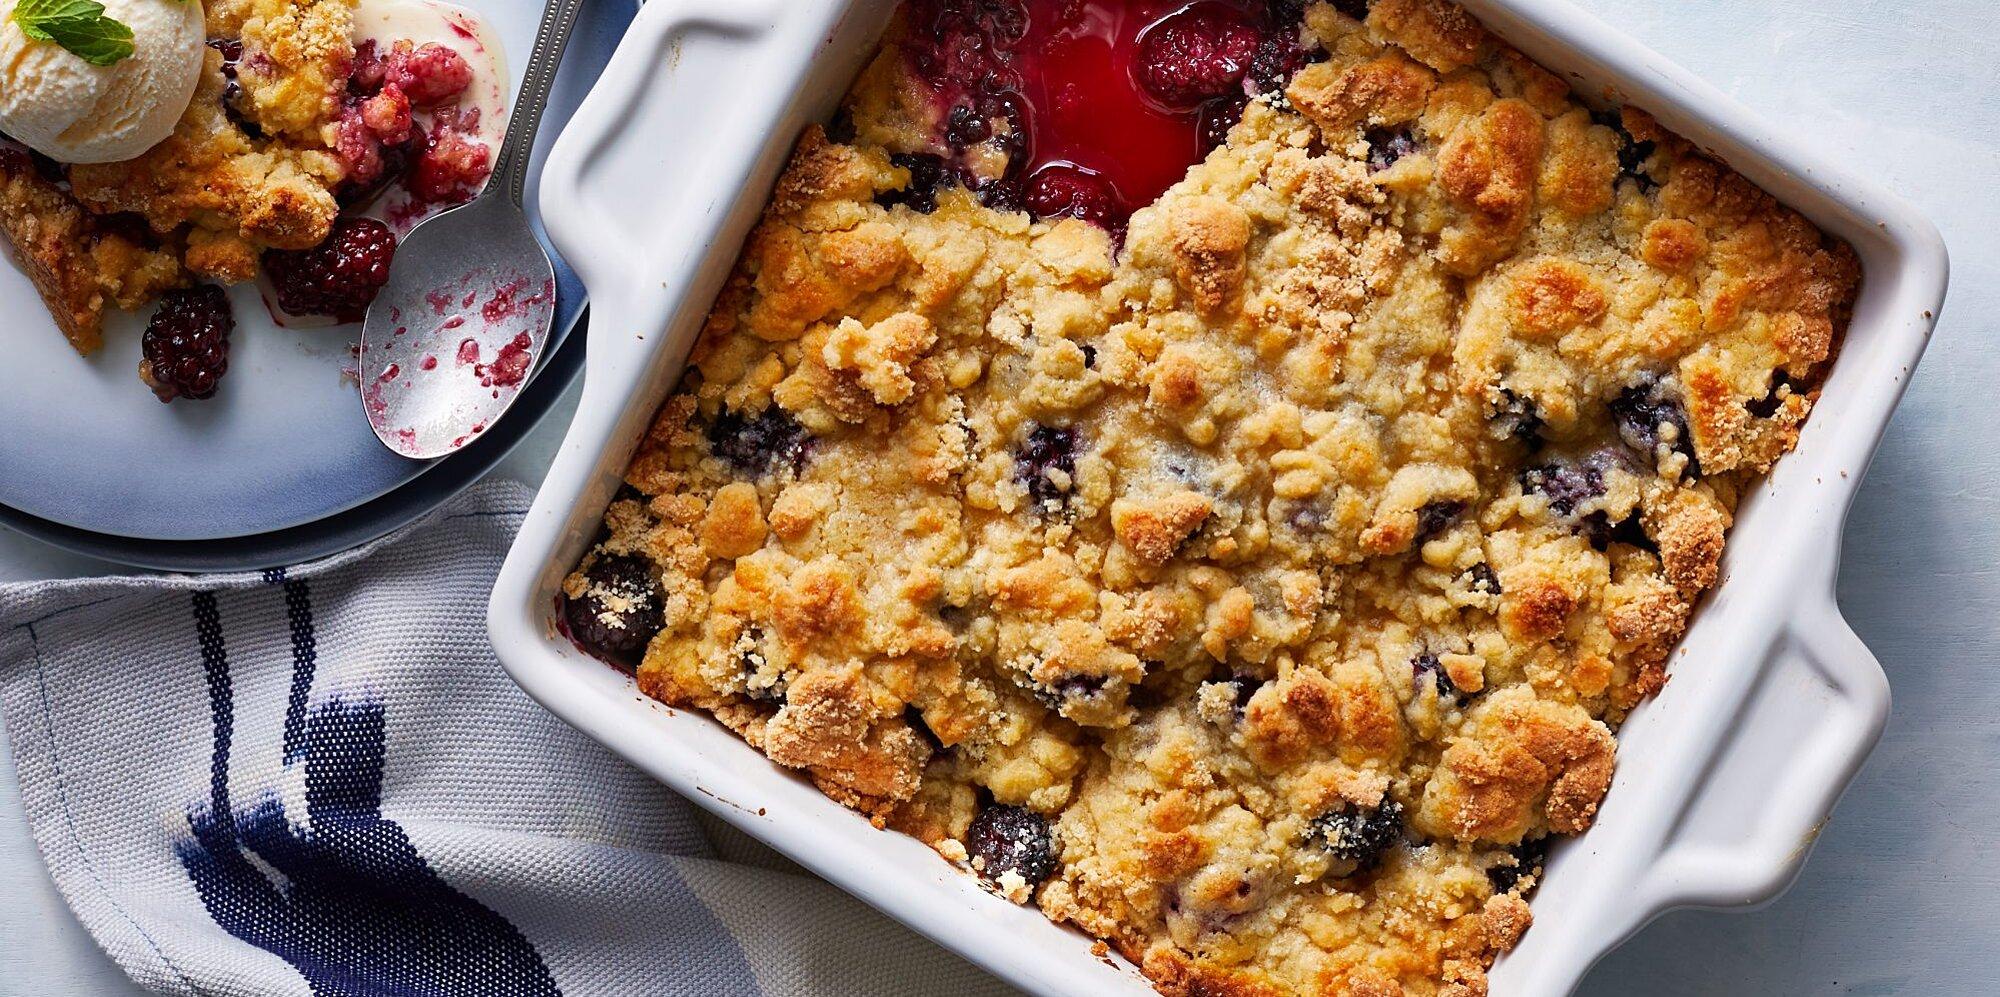 Low Carb Blueberry Cobbler - Gluten Free, Paleo   I Breathe I'm Hungry